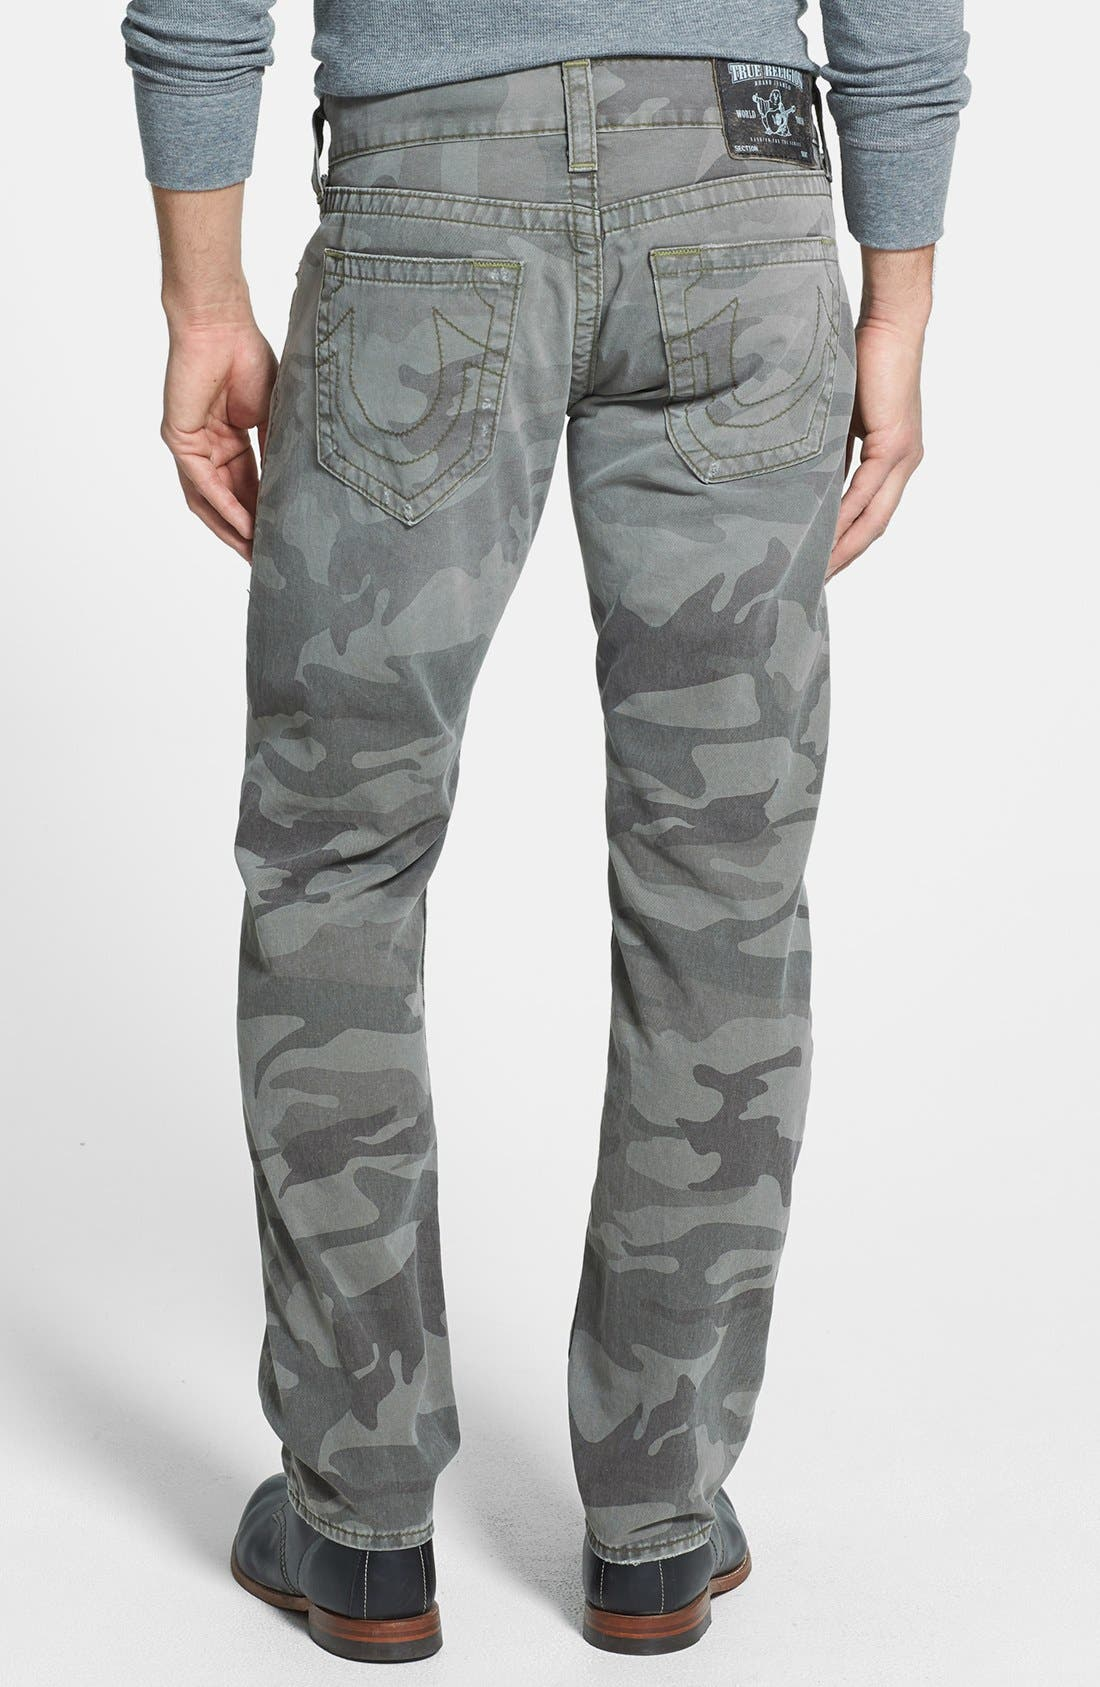 Main Image - True Religion Brand Jeans 'Geno' Straight Leg Camo Jeans (Abn Deringer)